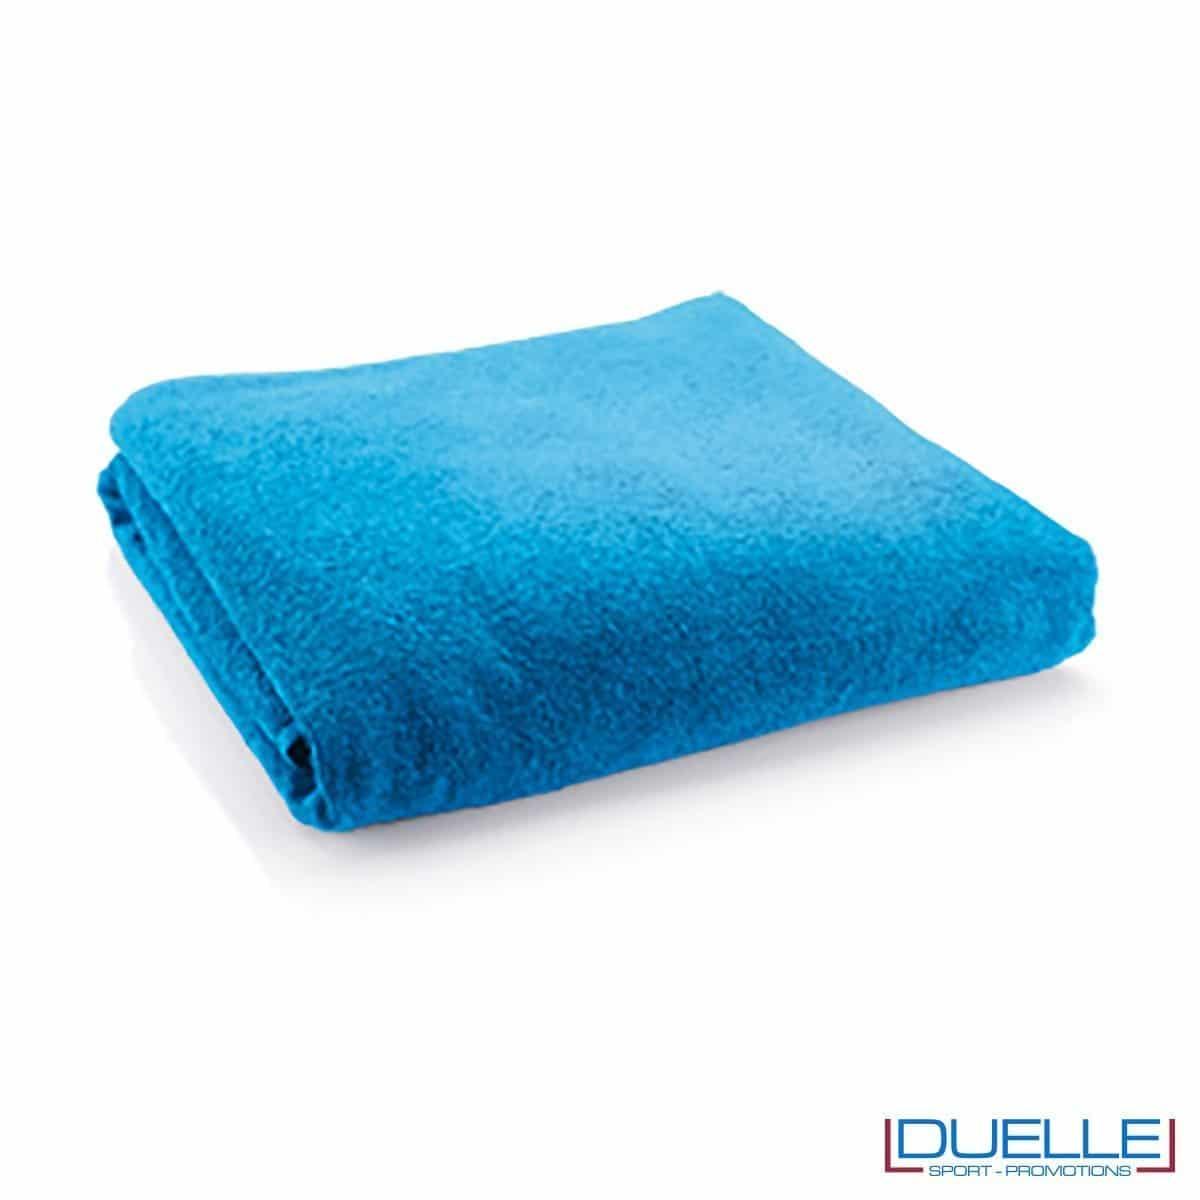 telo personalizzato cotone bilu royal, gadget mare, gadget personalizzato blu royal